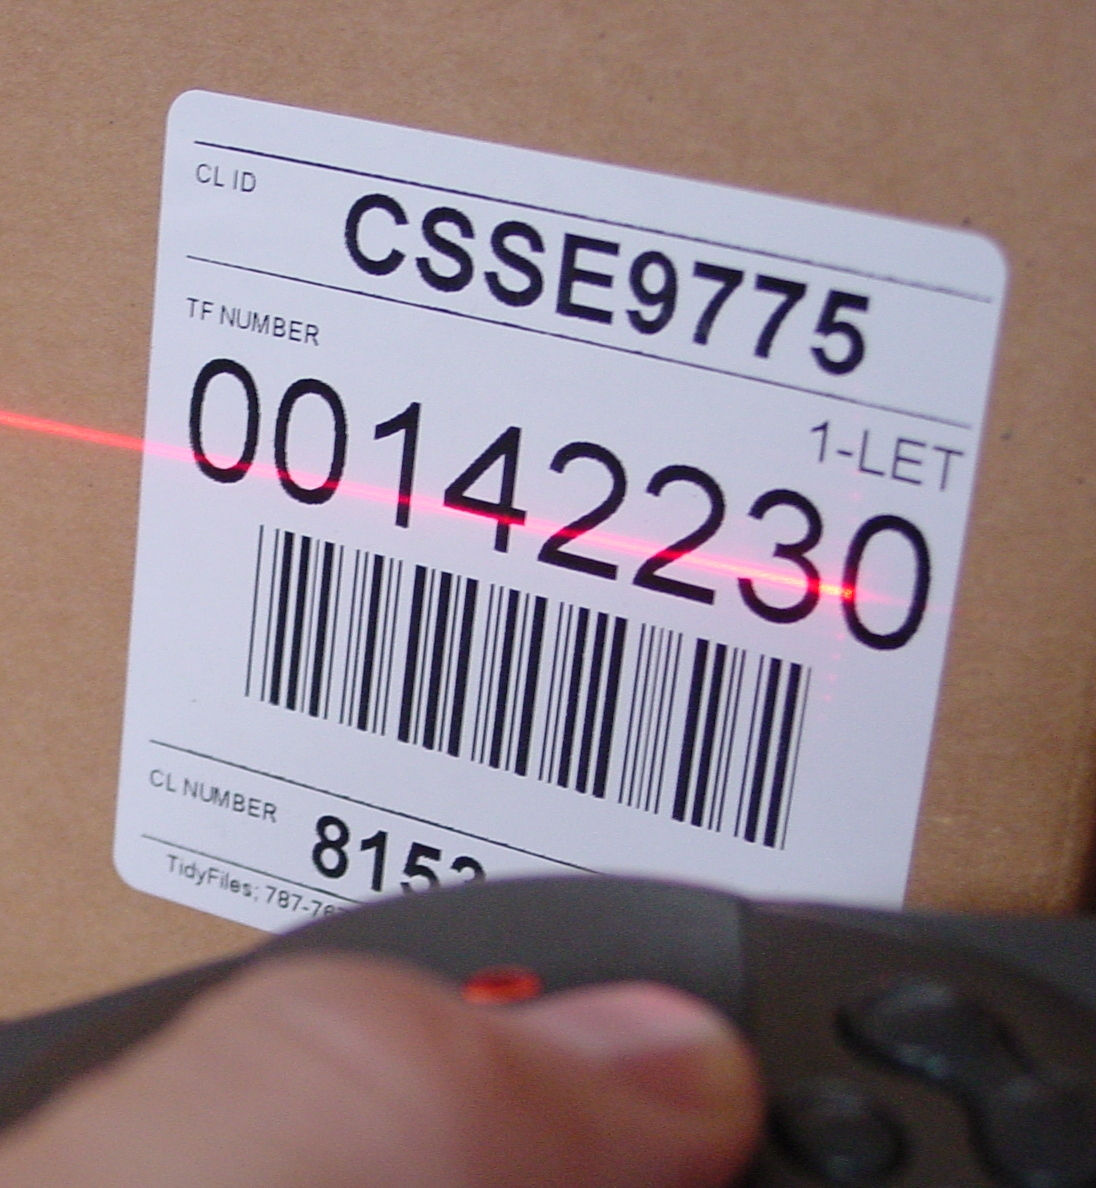 Scannning Barcode closeup